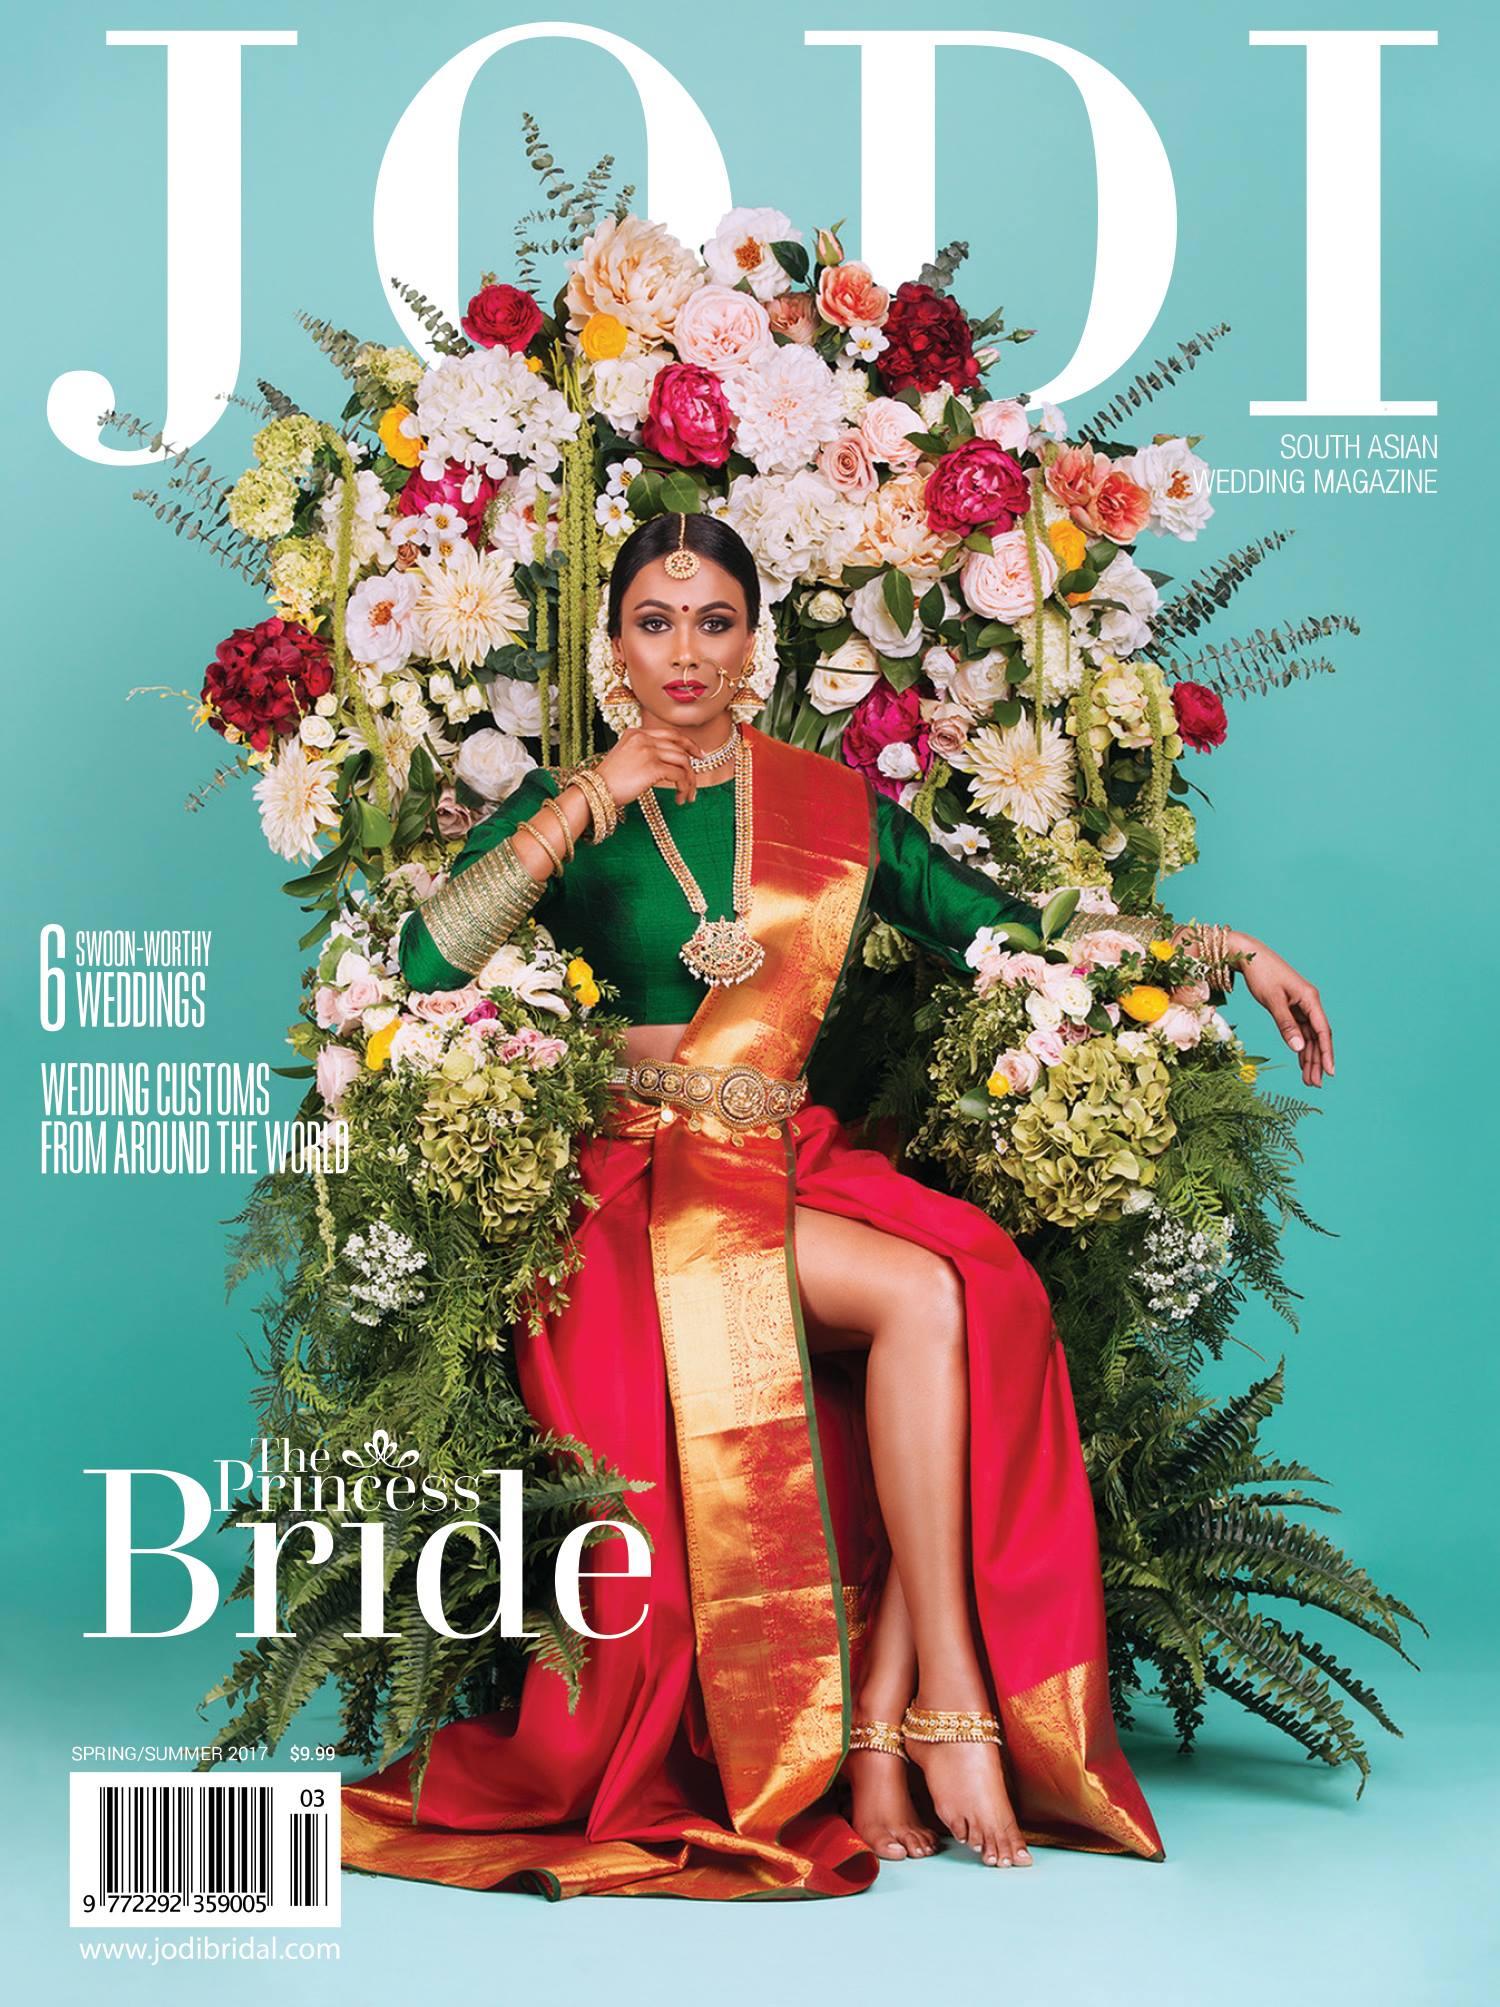 Jodi Bridal Show magazine cover